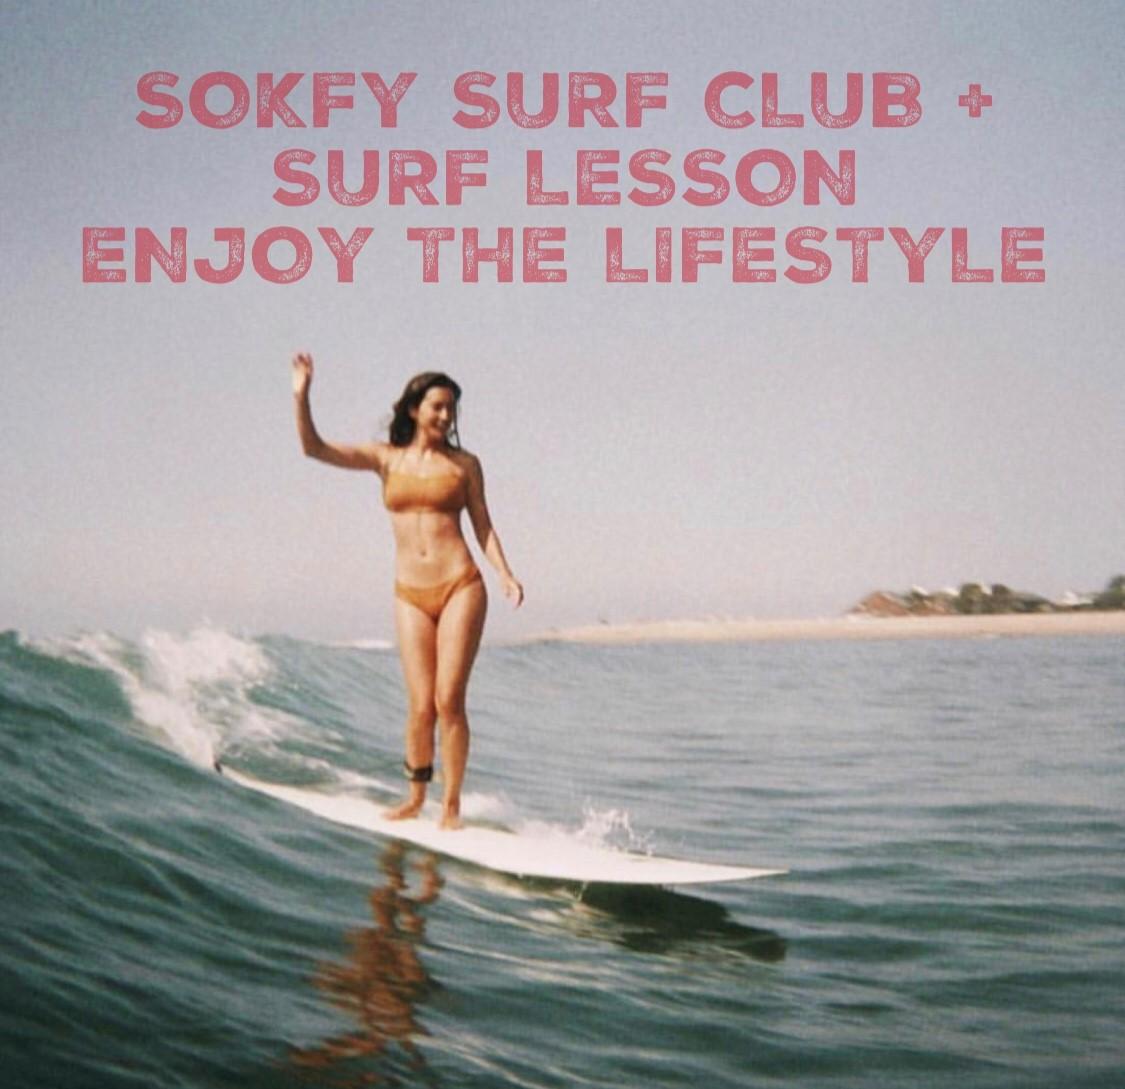 SOKFY Surf Lessons.jpg